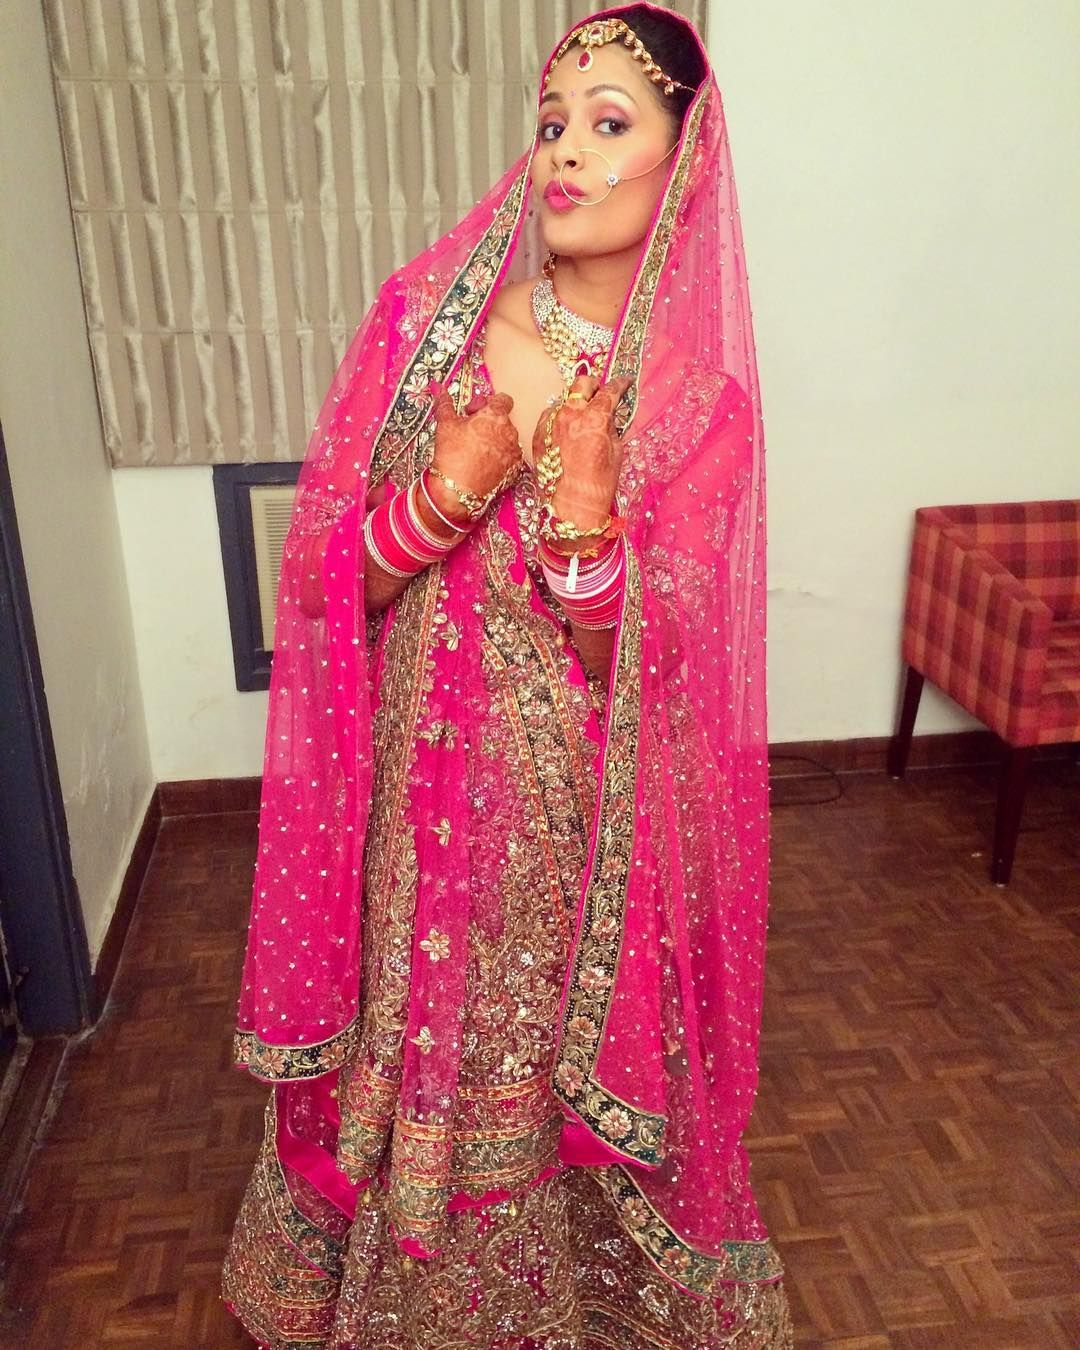 Nostalgia. #throwback #wedding #weddingday #bride ...